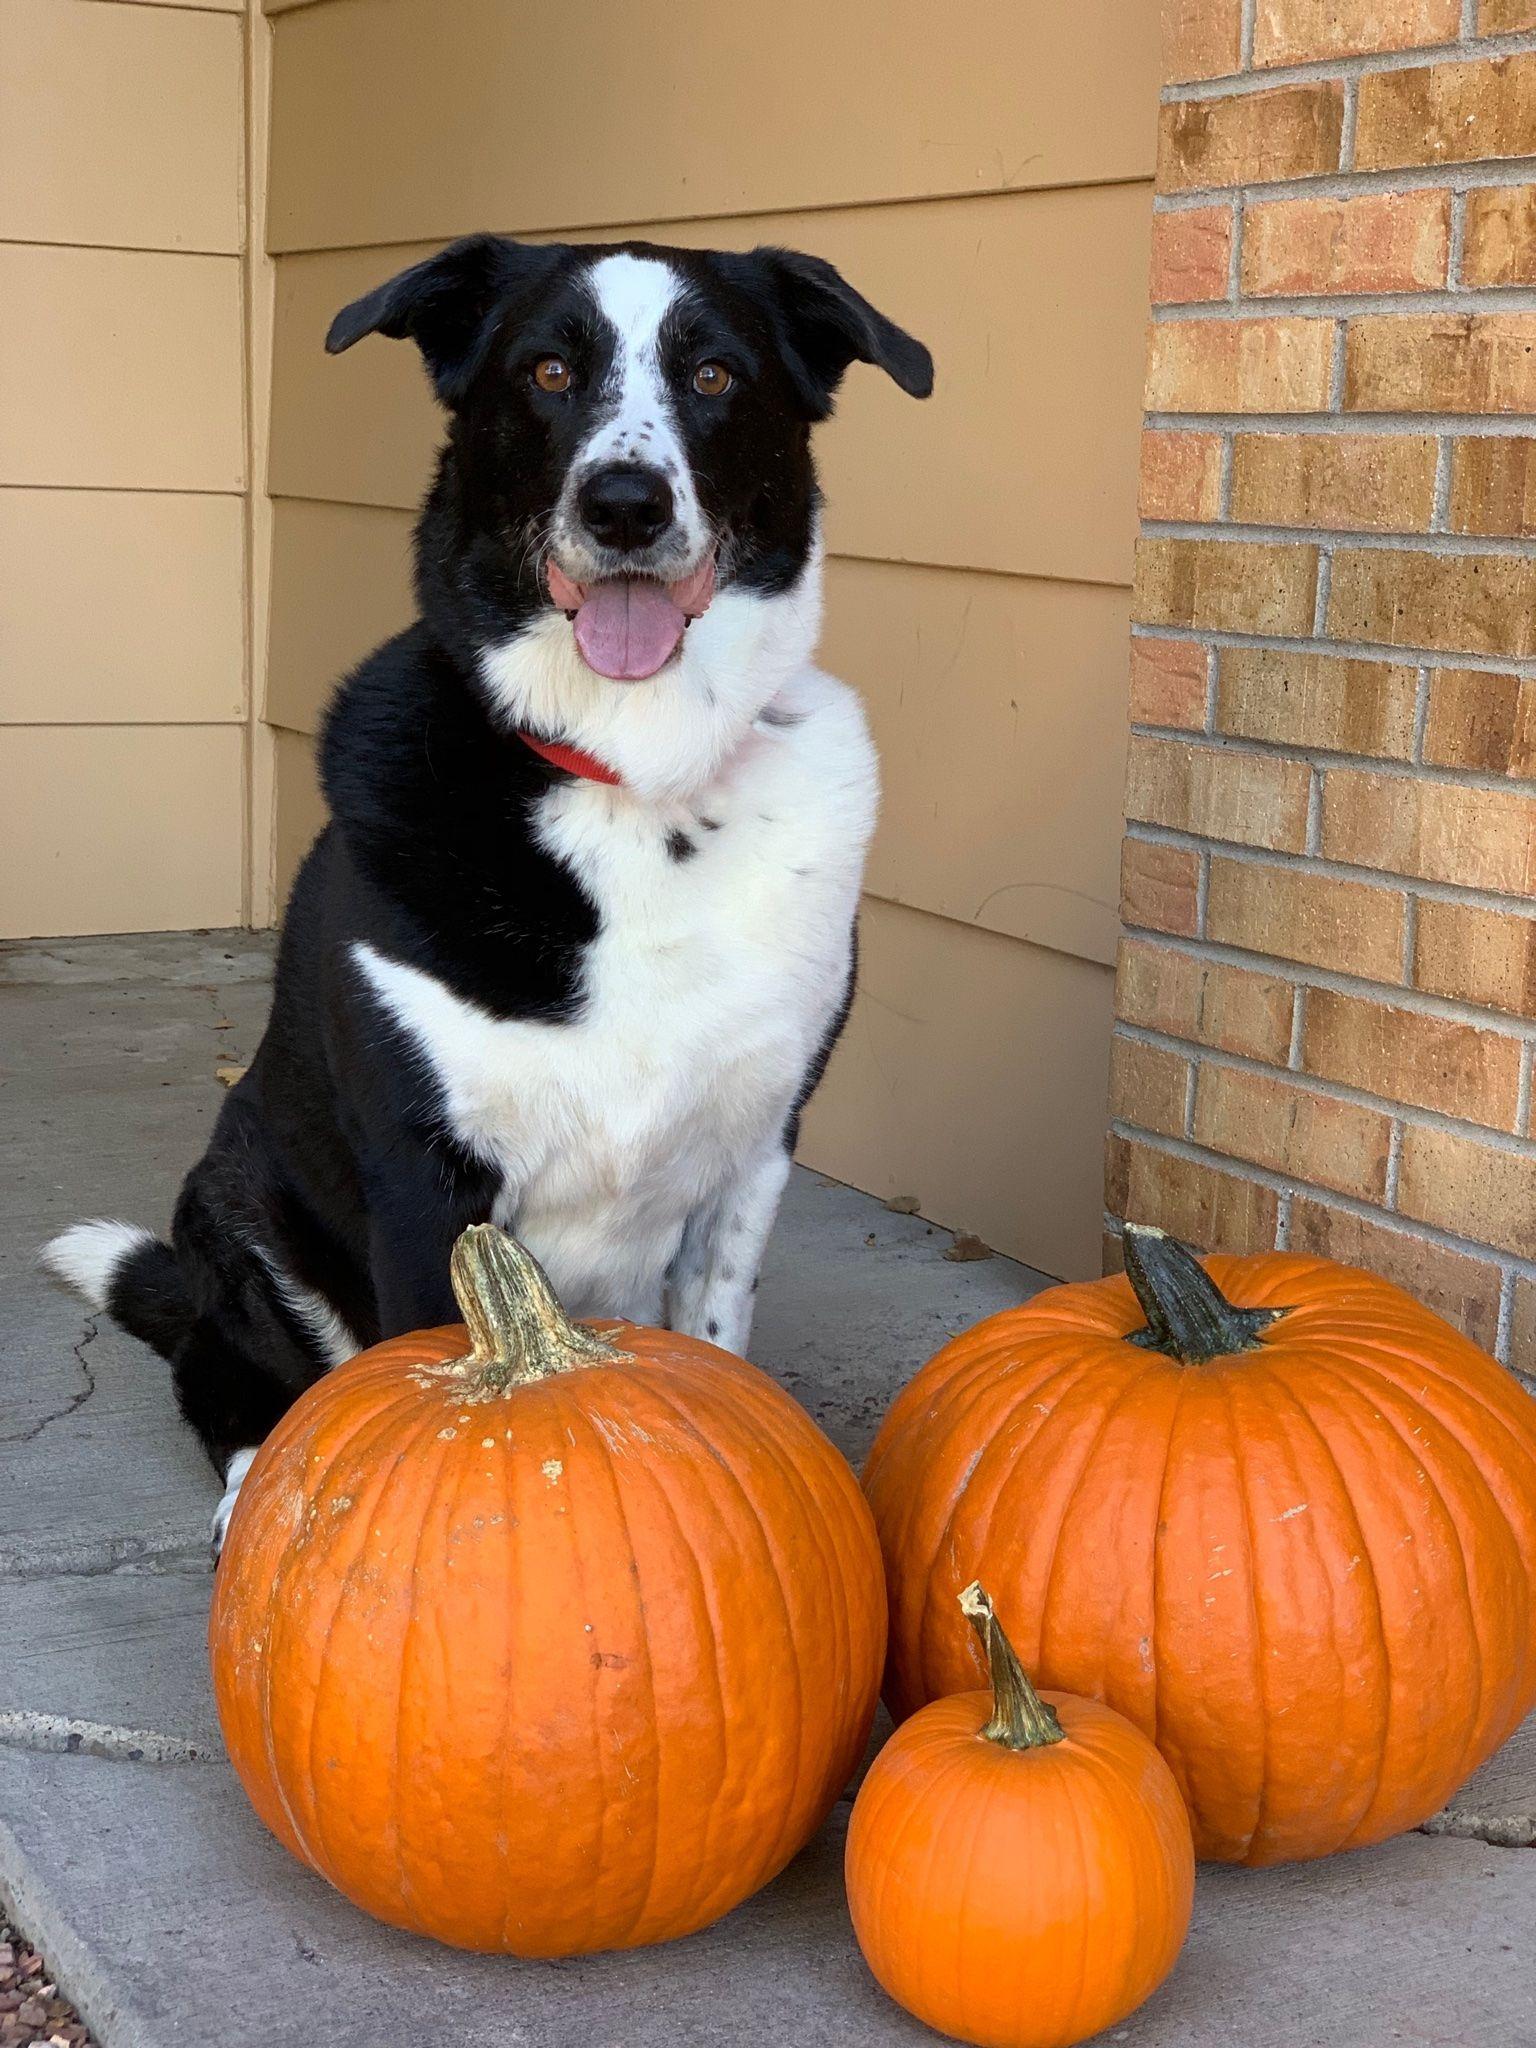 Dog and Pumpkins Border collie dog, Pumpkin, Collie dog